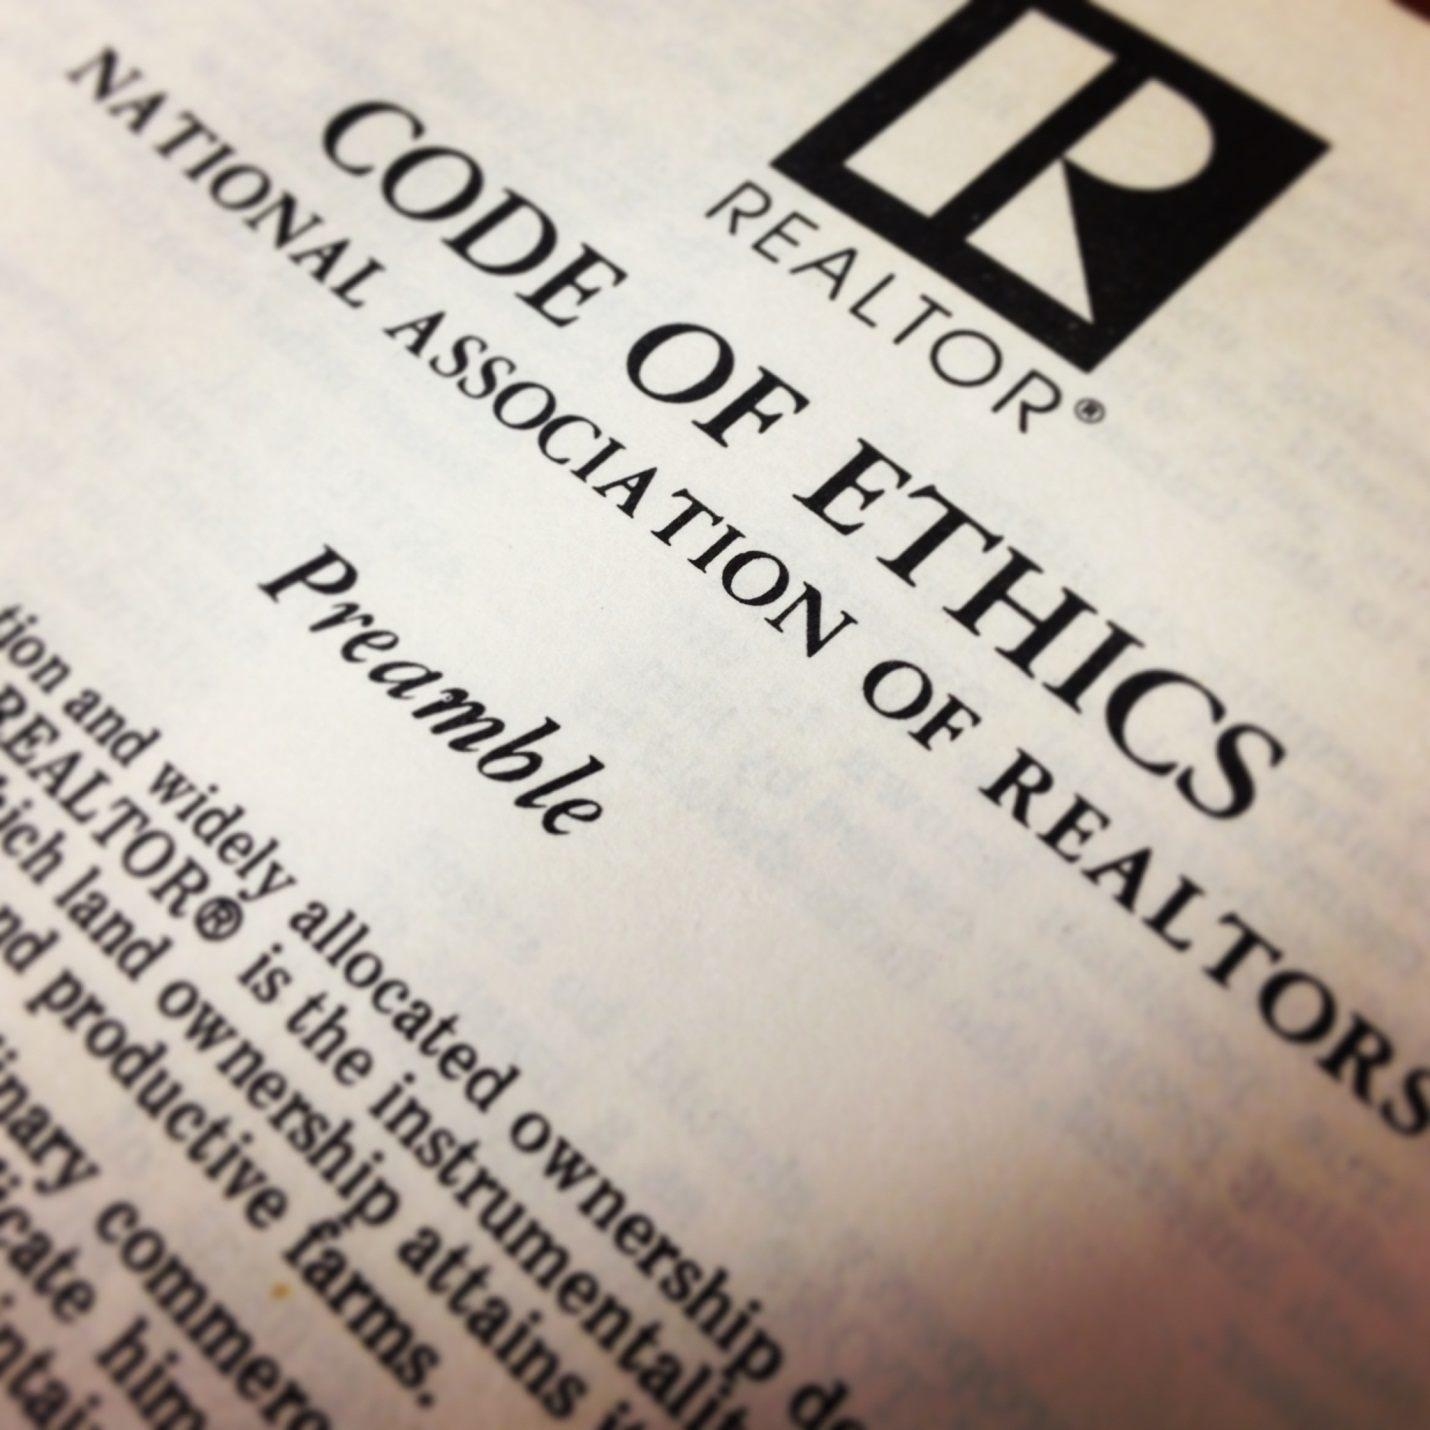 realtor code of ethic